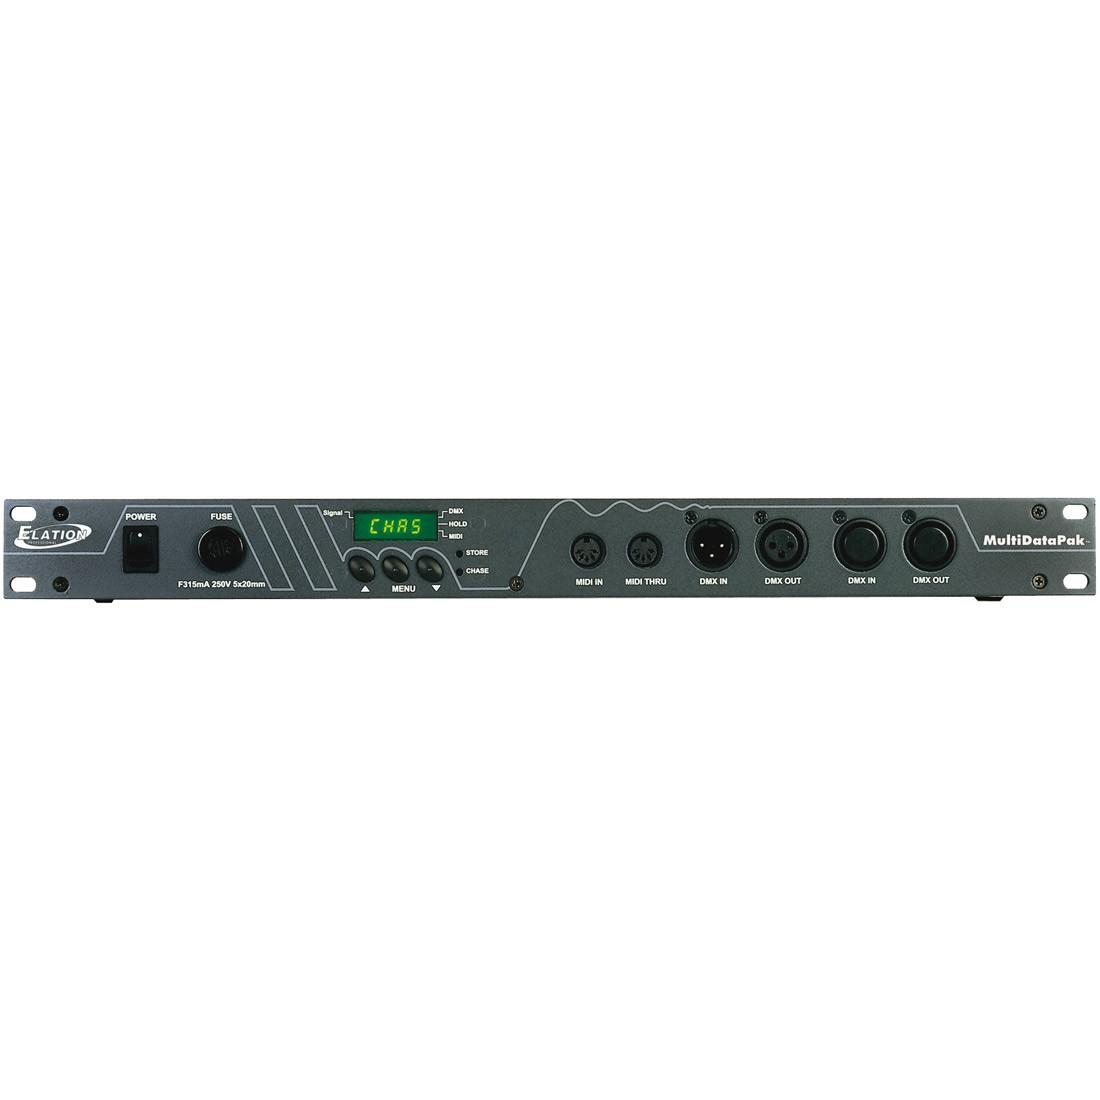 Demultiplexeur DMX512 vers 0-10V elation Multi Data/PAK 72 canaux